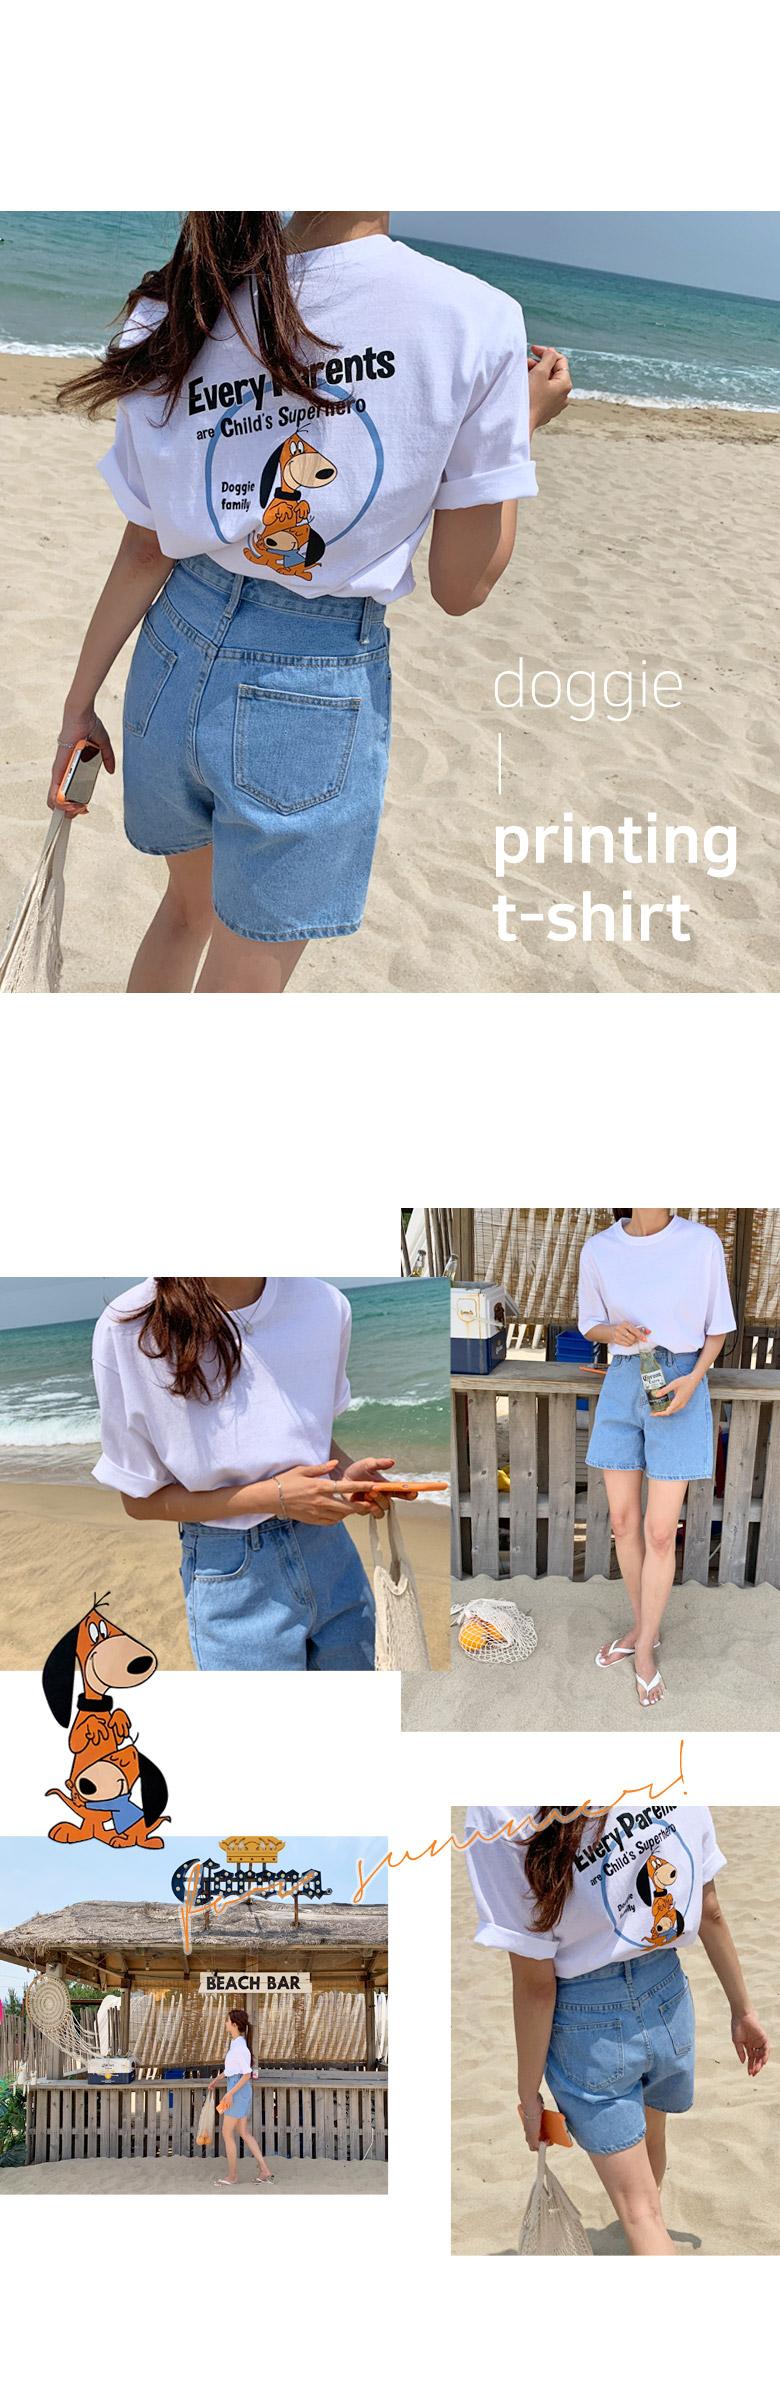 Doggy Bag Printing Short-sleeved T-shirt